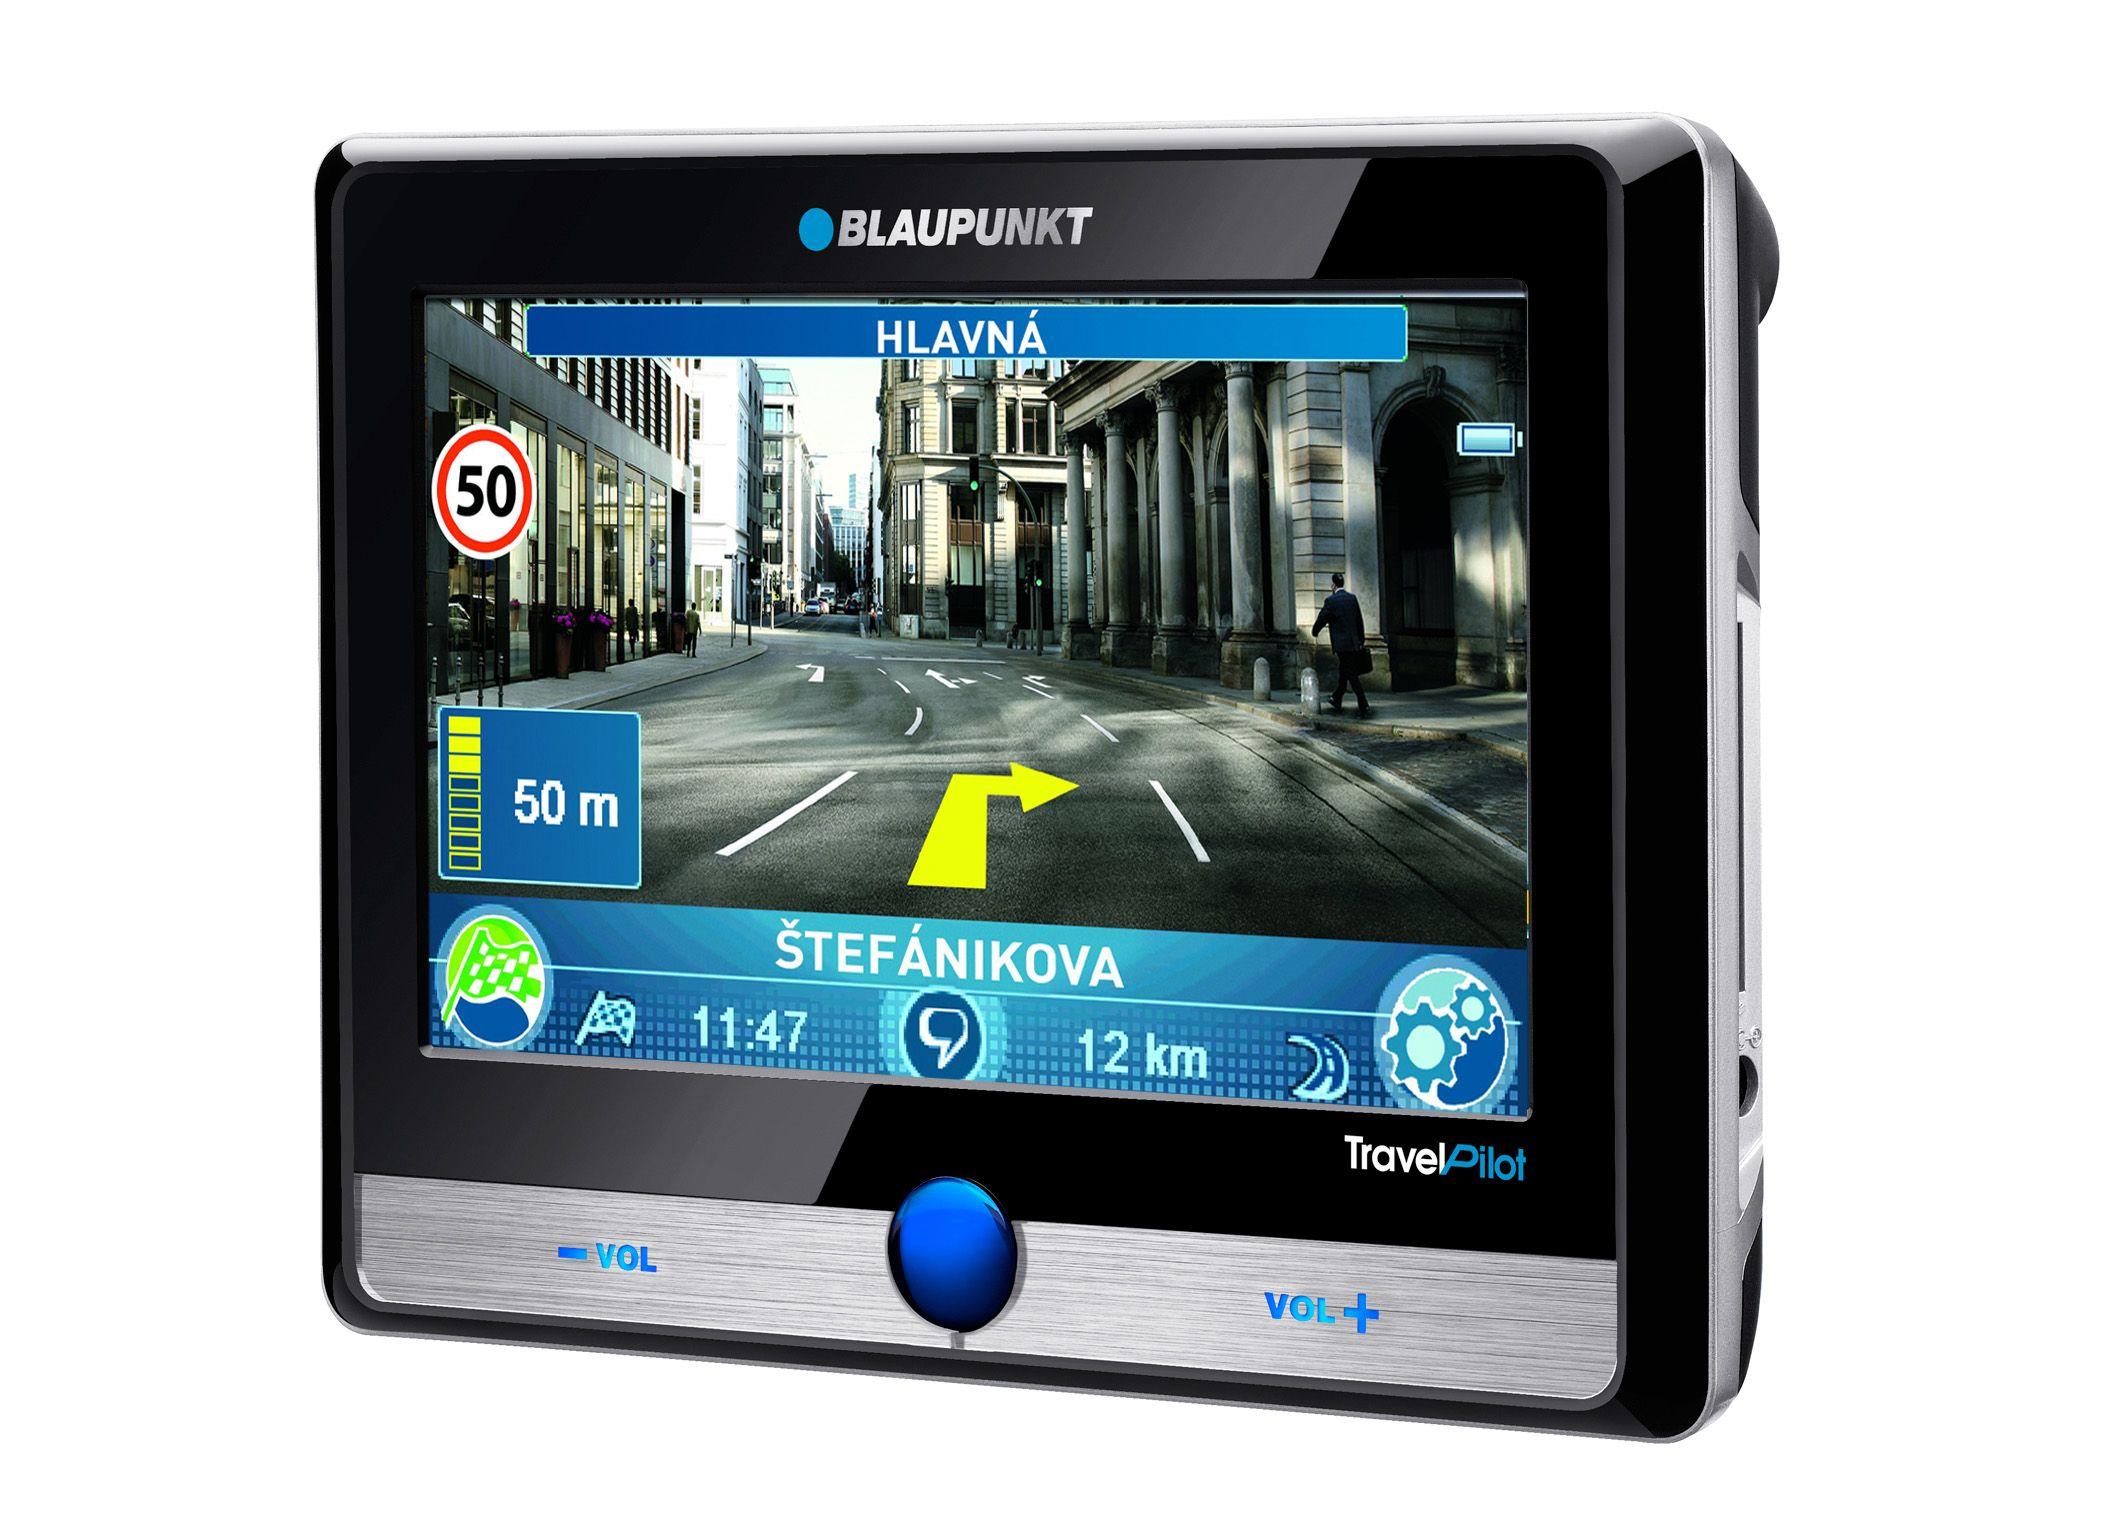 dc36a173d7 Pridať odbornú recenziu Blaupunkt TravelPilot 500 - Heureka.sk